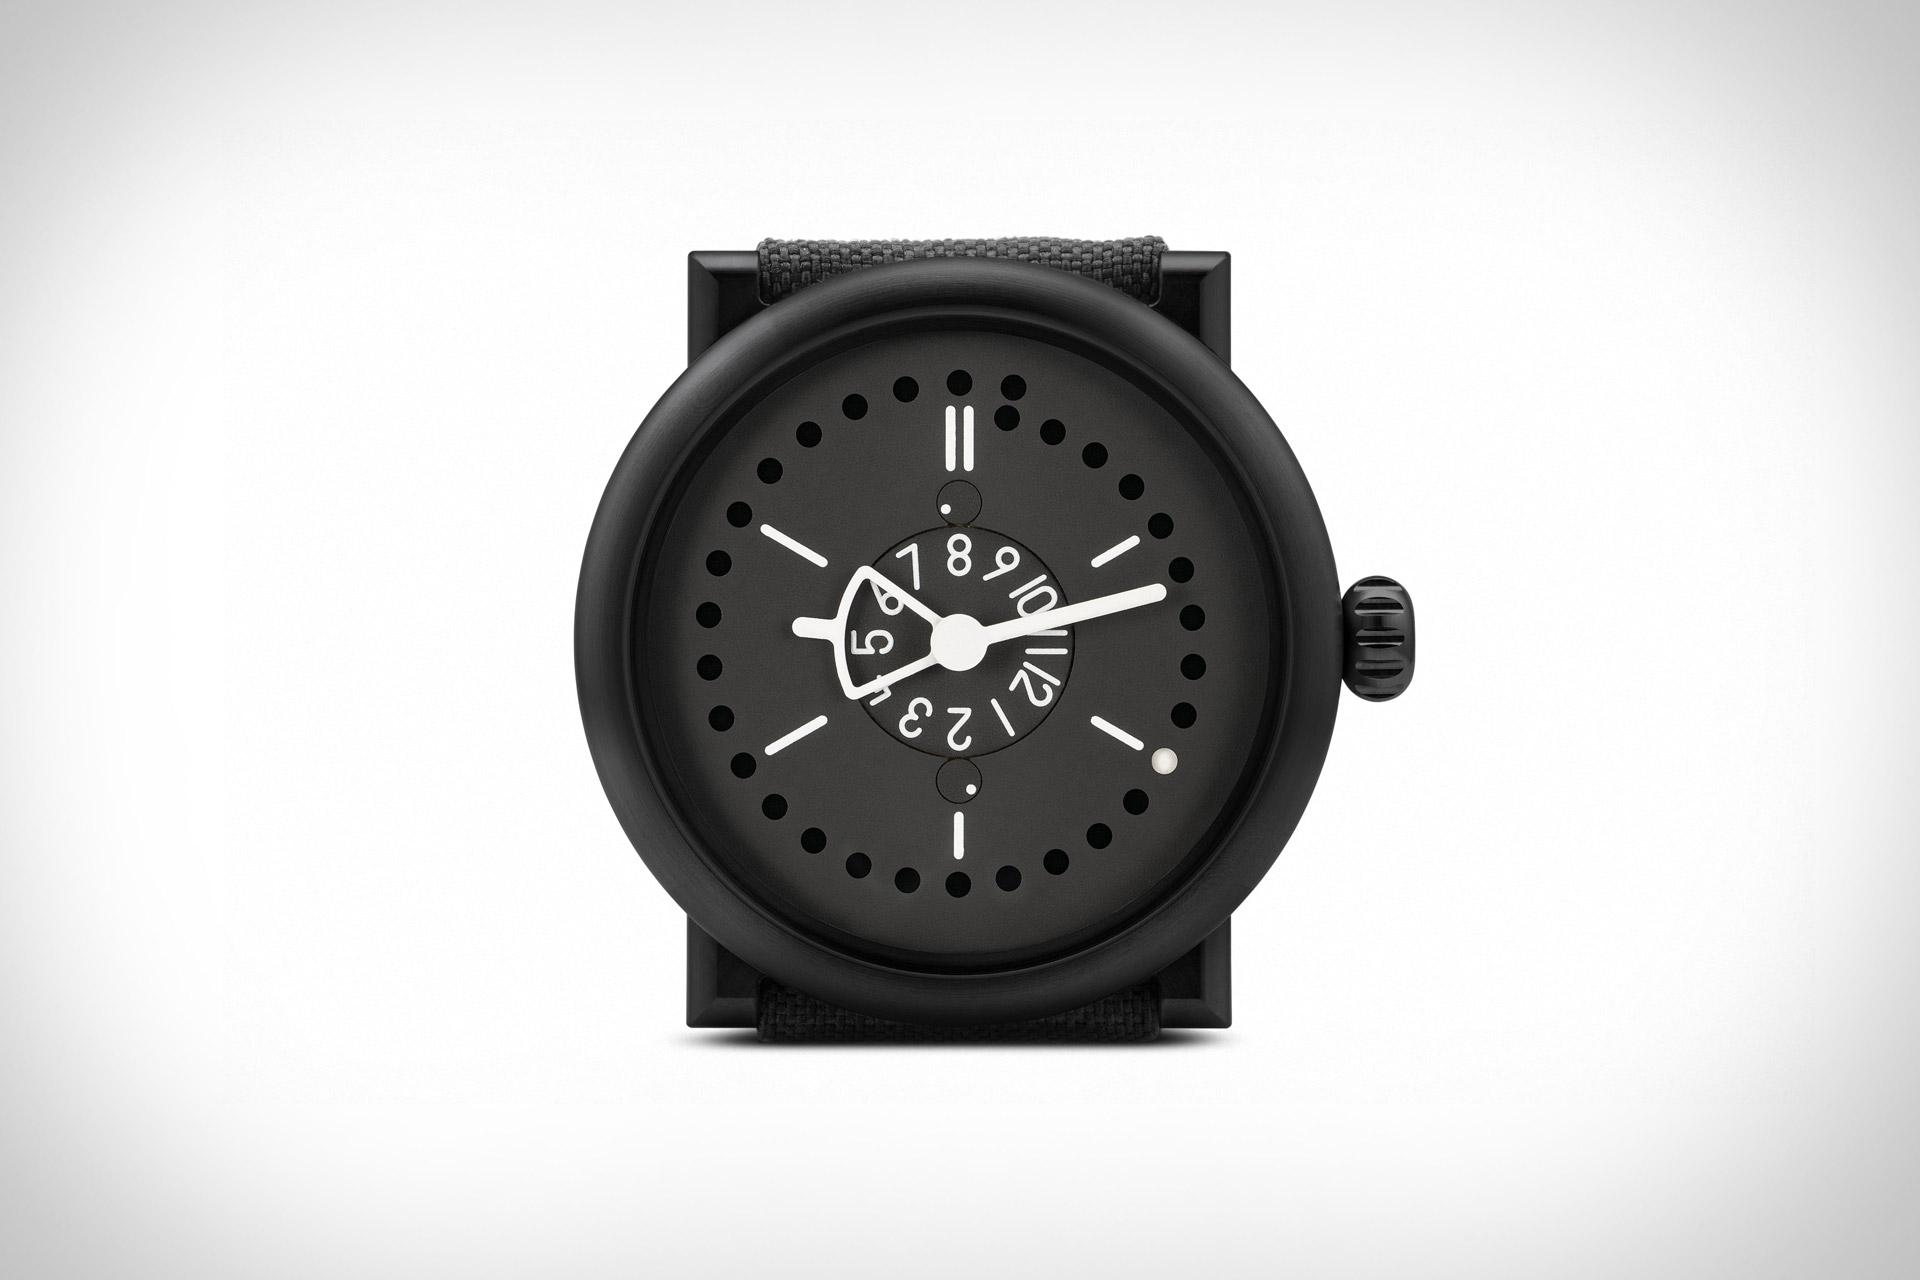 harley davidson clocks cool timepieces